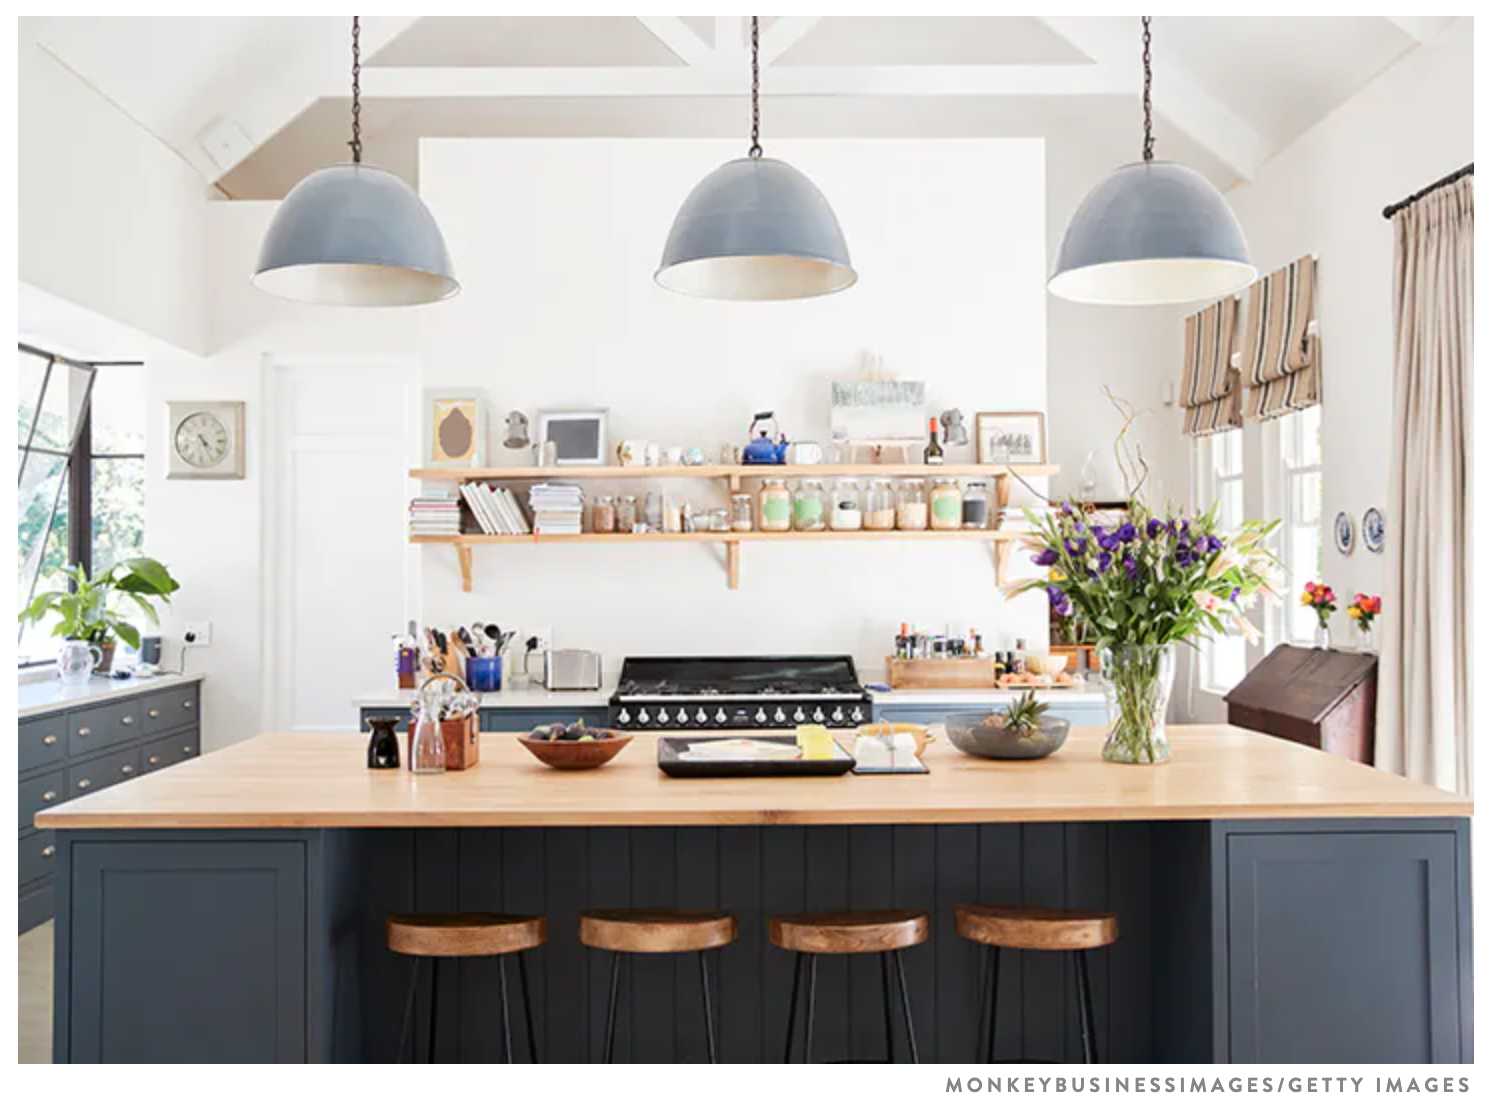 Trend: Kitchen Tables vs. Islands